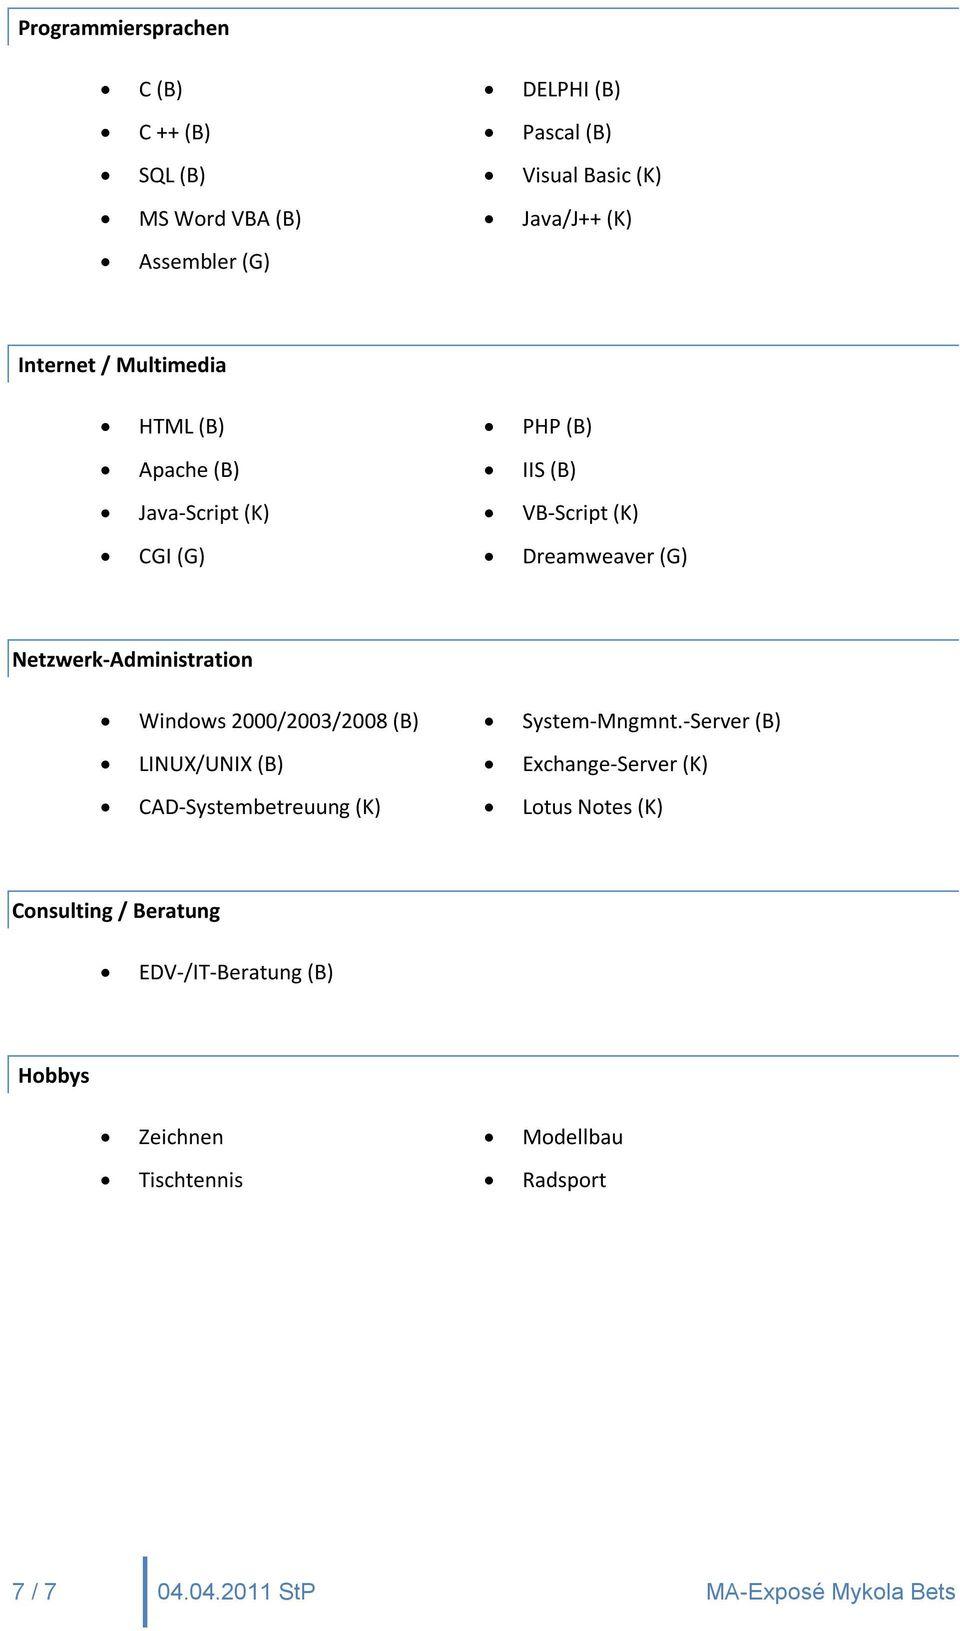 server b linux unix b exchange server k cad systembetreuung k